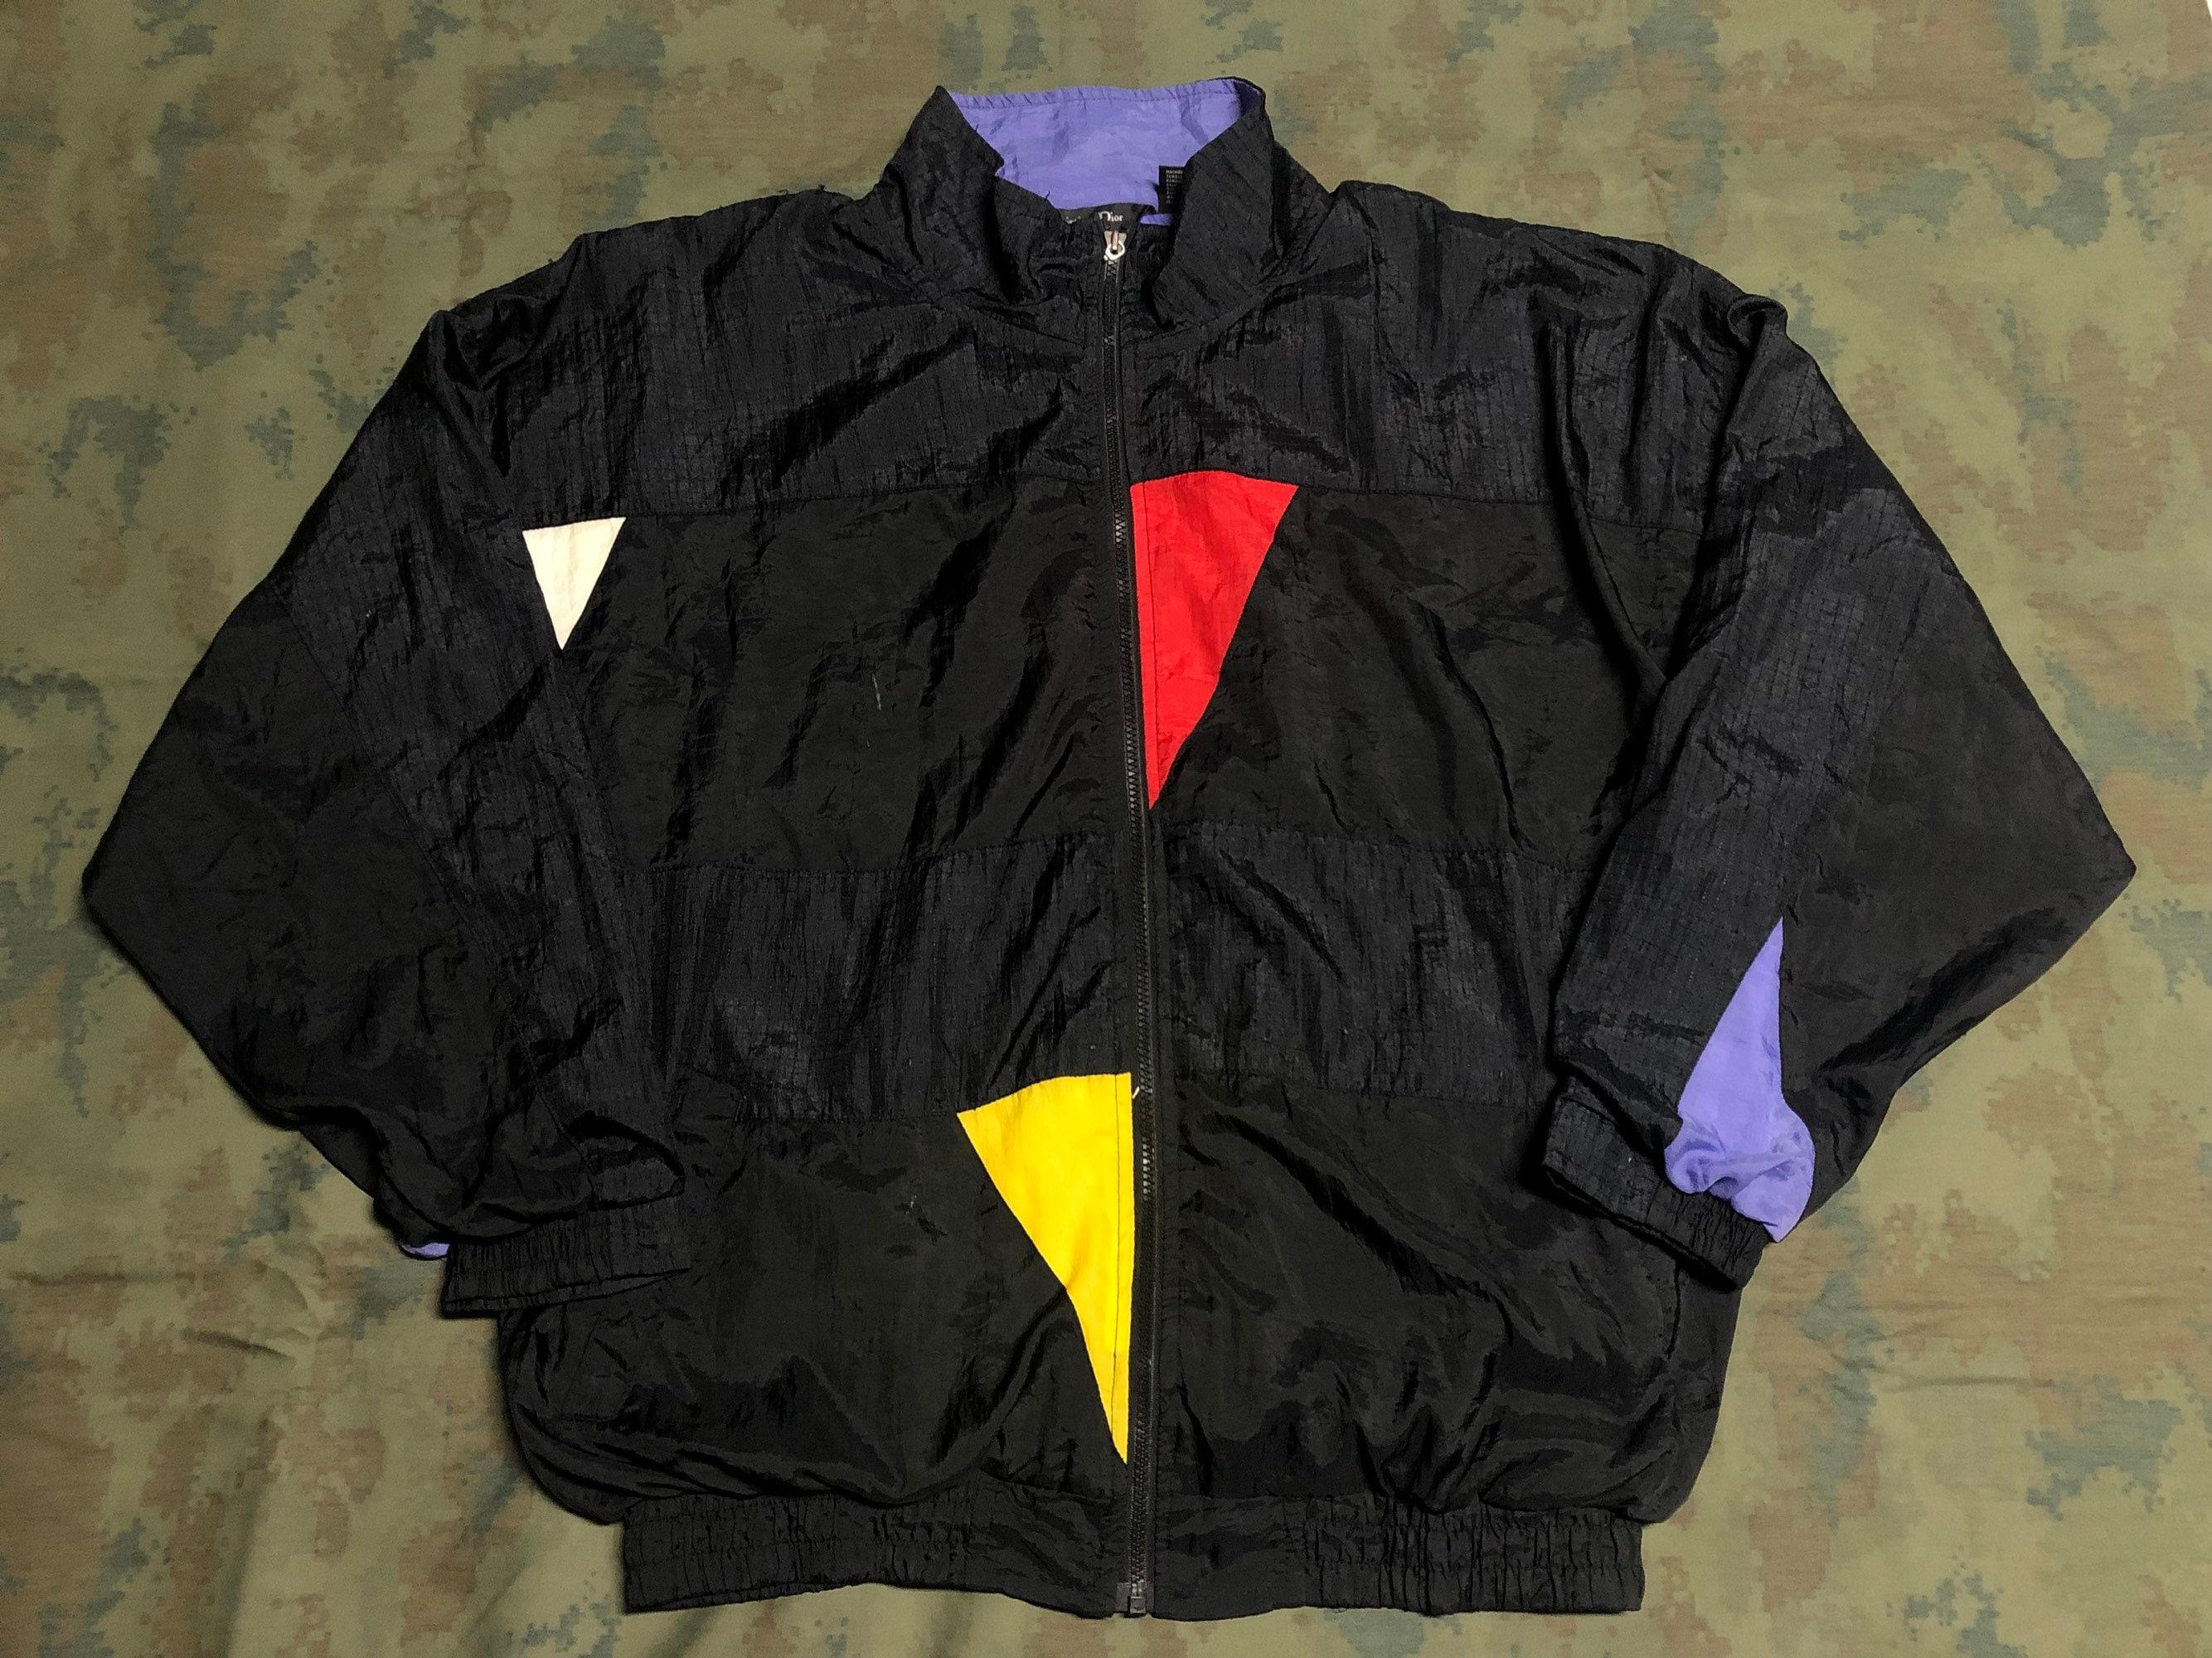 f1ad7d30e20d 90 Vintage taille Christian Dior veste taille Vintage XL 14fdcd ...